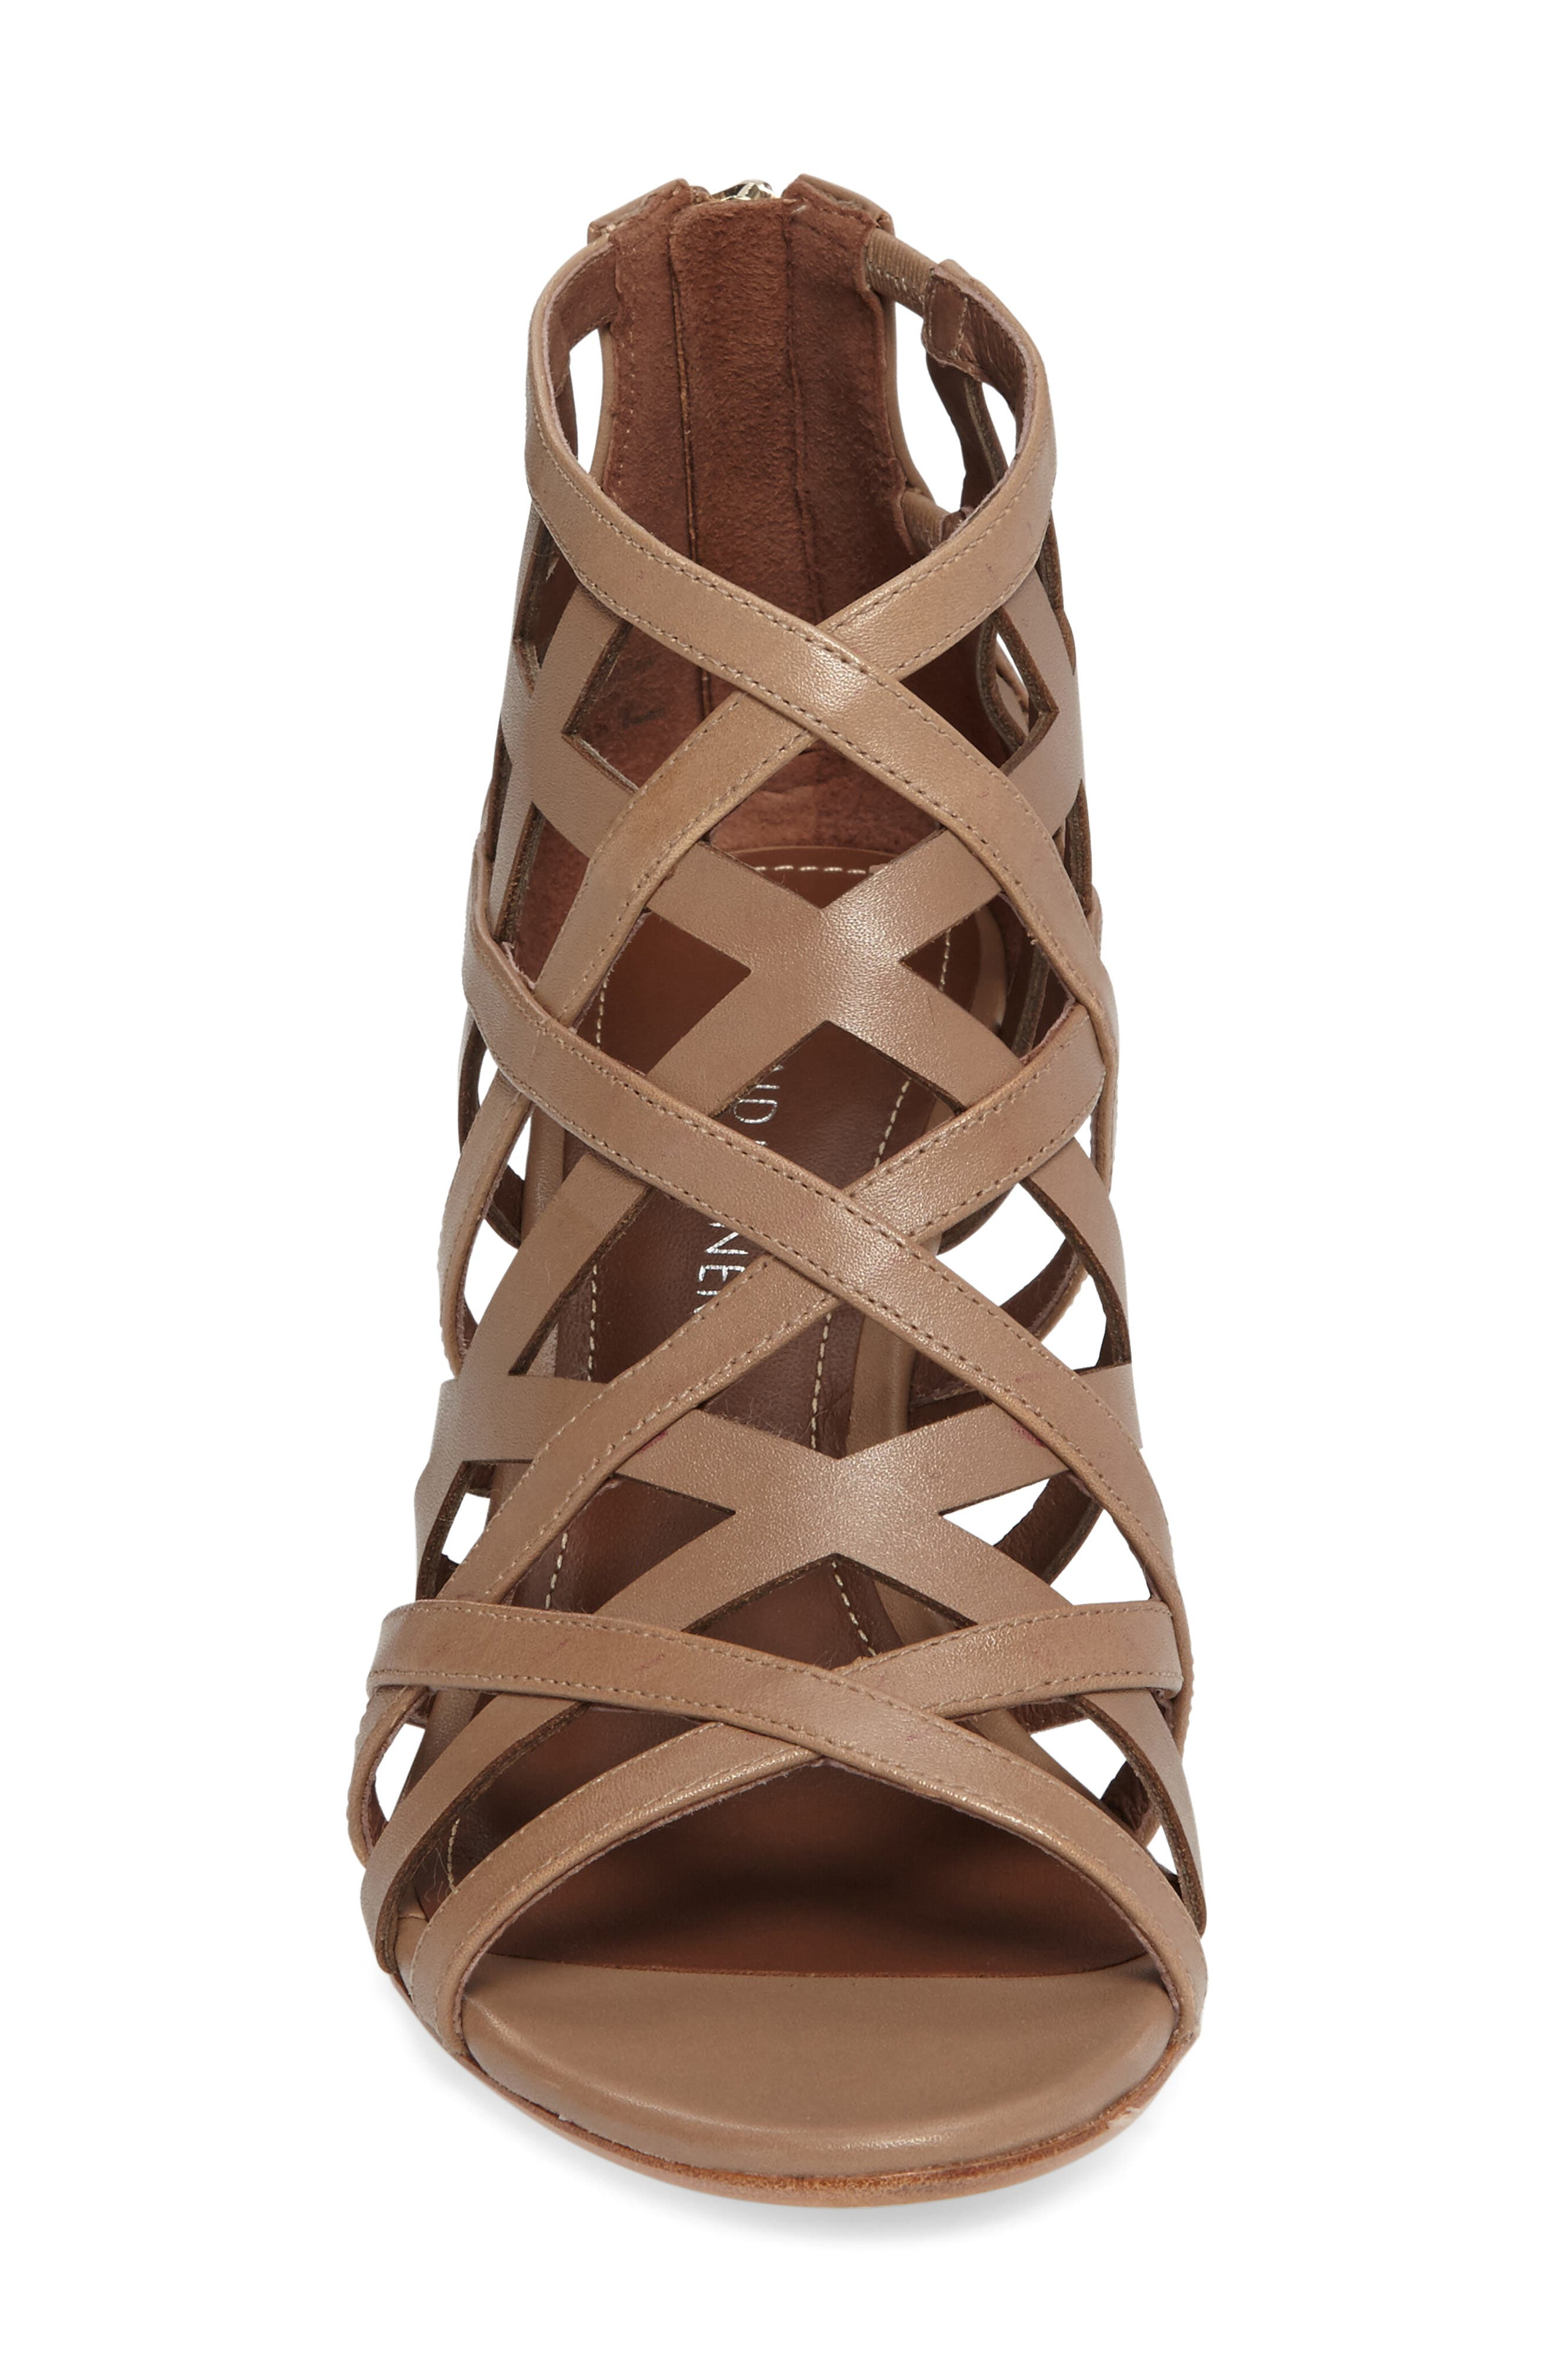 Alternate Image 3  - Donald J Pliner Jordan Wedge Sandal (Women)